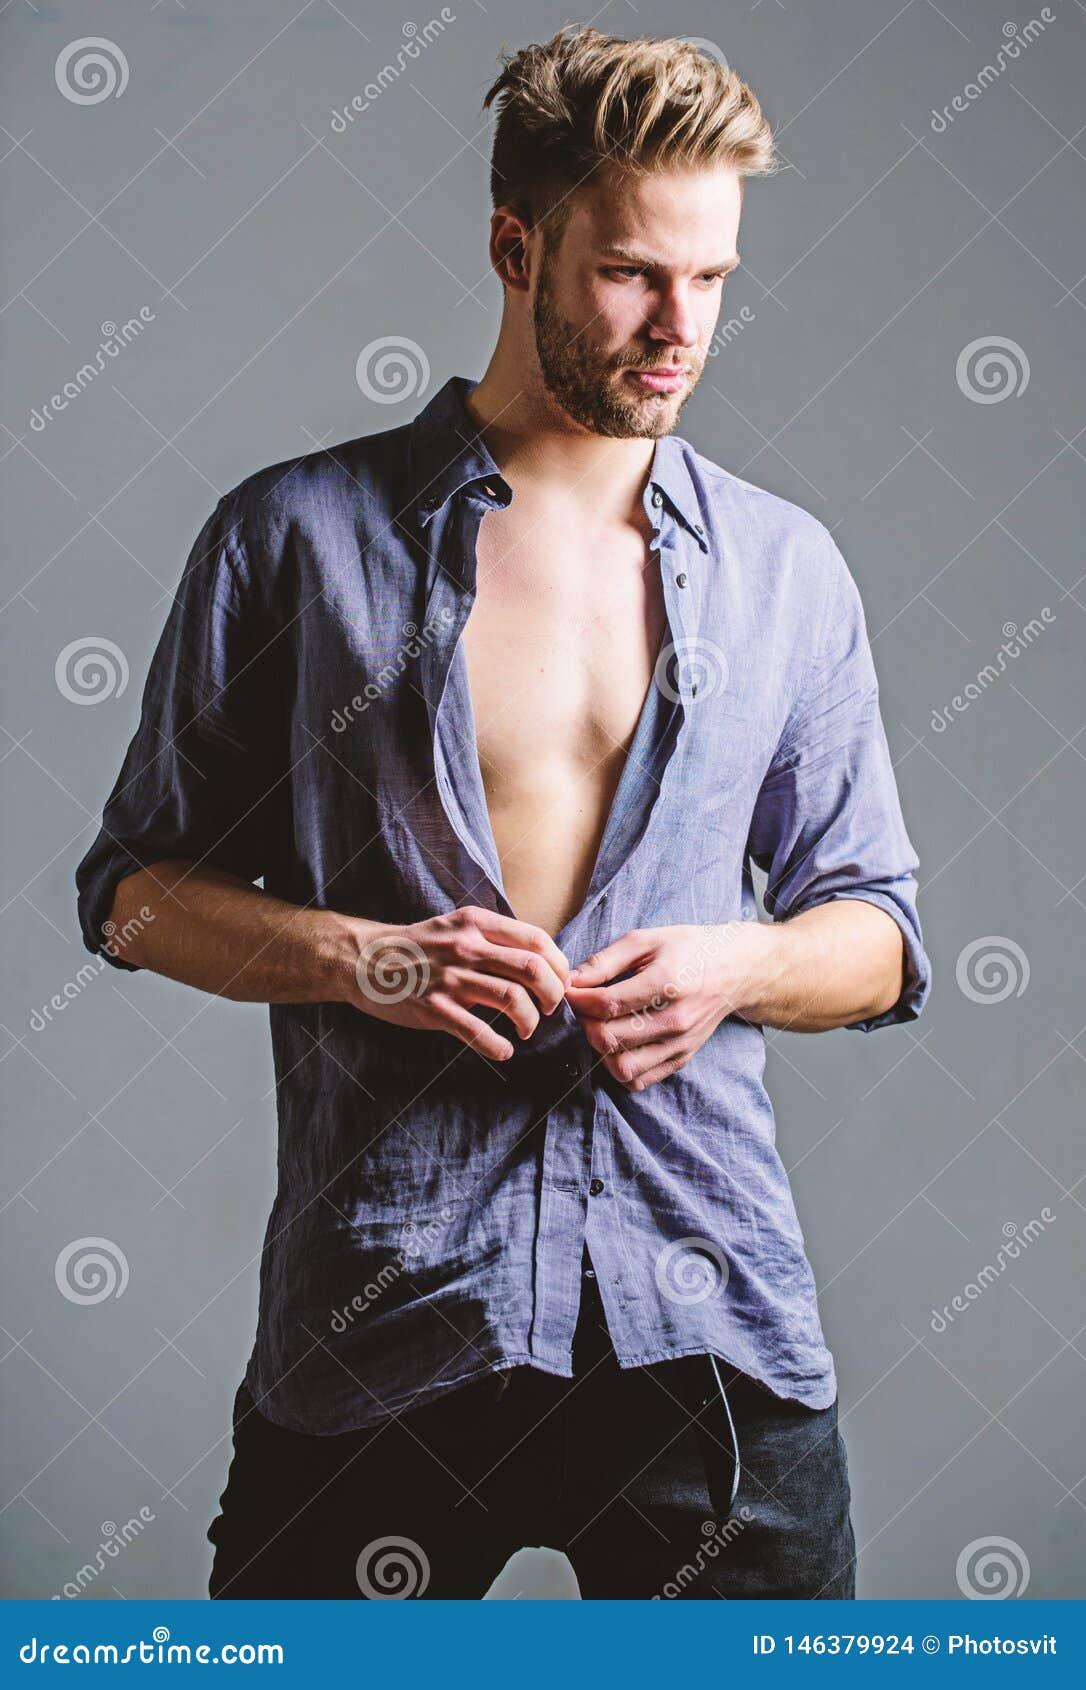 Sentimento livre e seguro Beleza masculina da forma Macho muscular  sexy  Dieta da aptid?o Desejo e tenta??o Seis blocos de